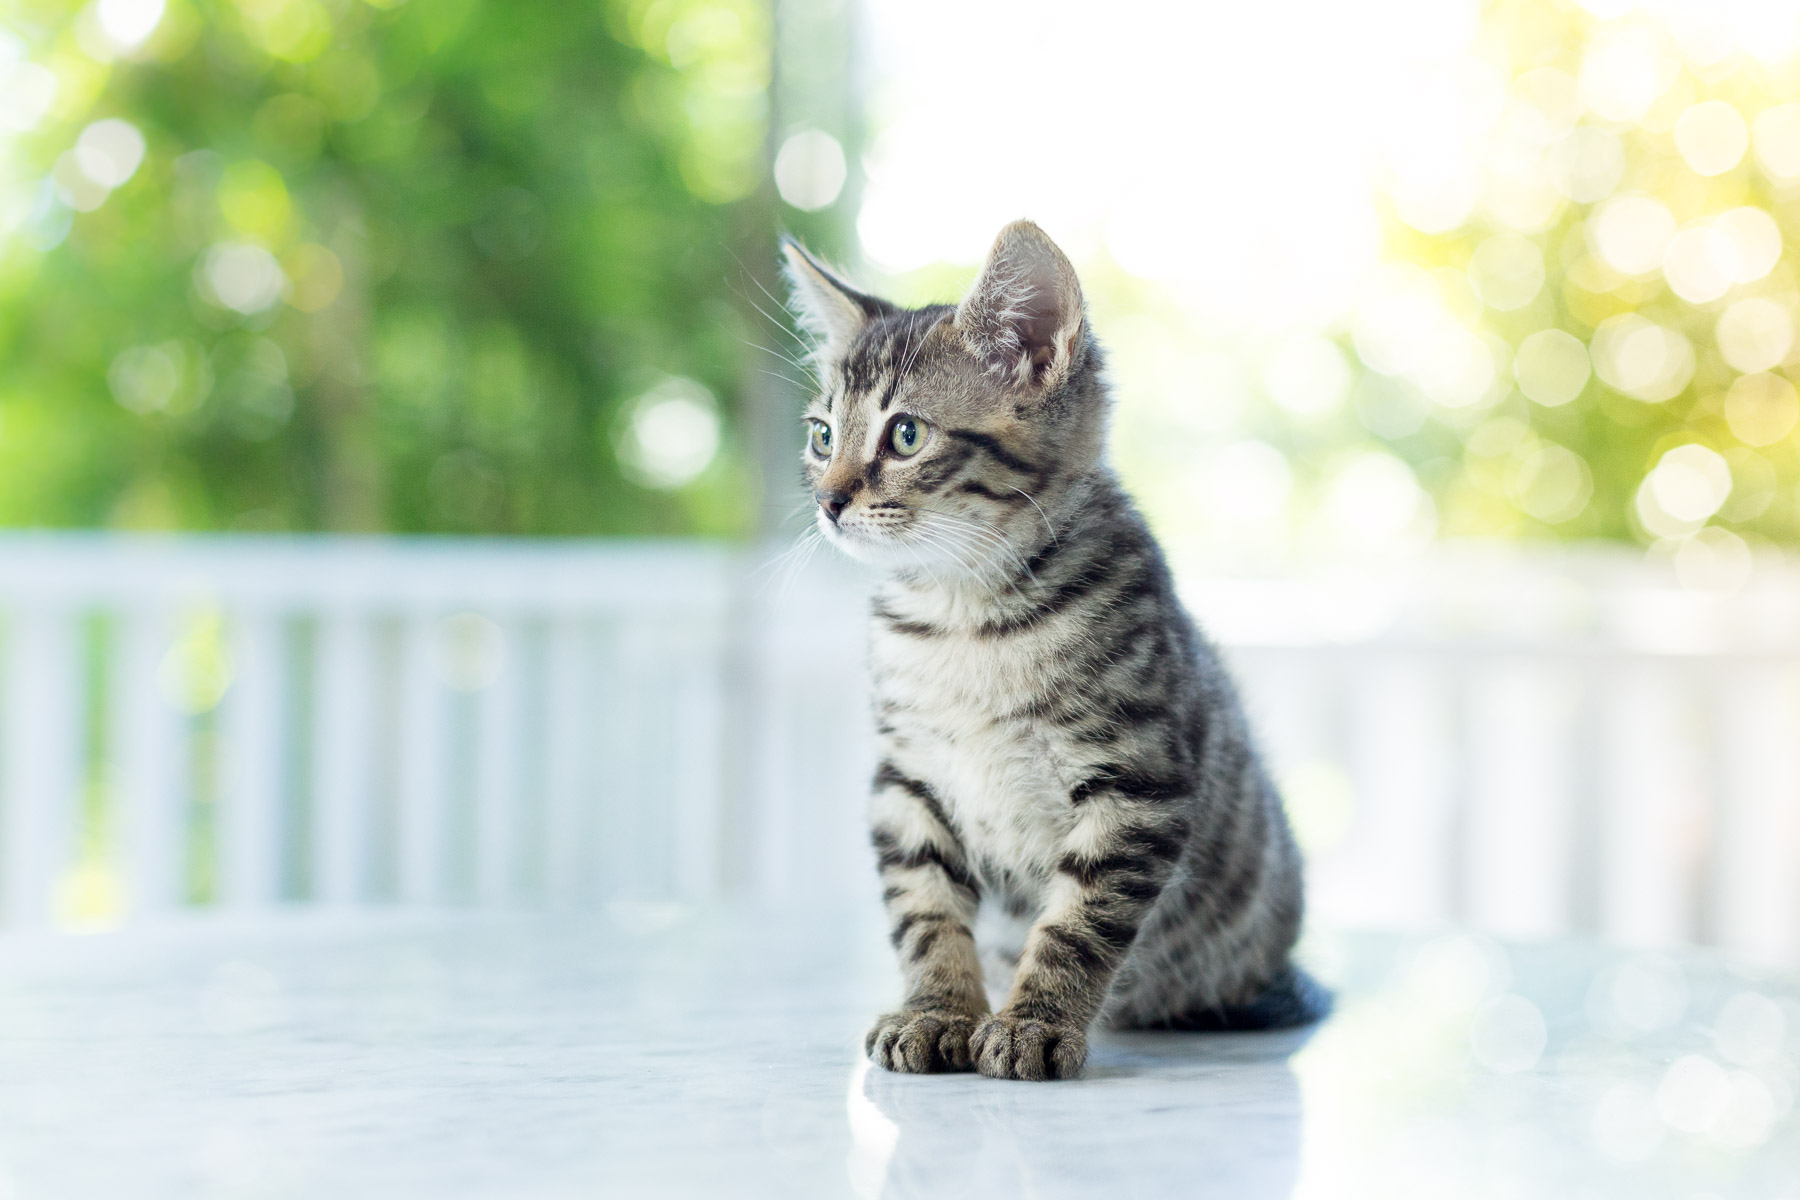 little-kitty-cat-portrait-animal-photography.jpg